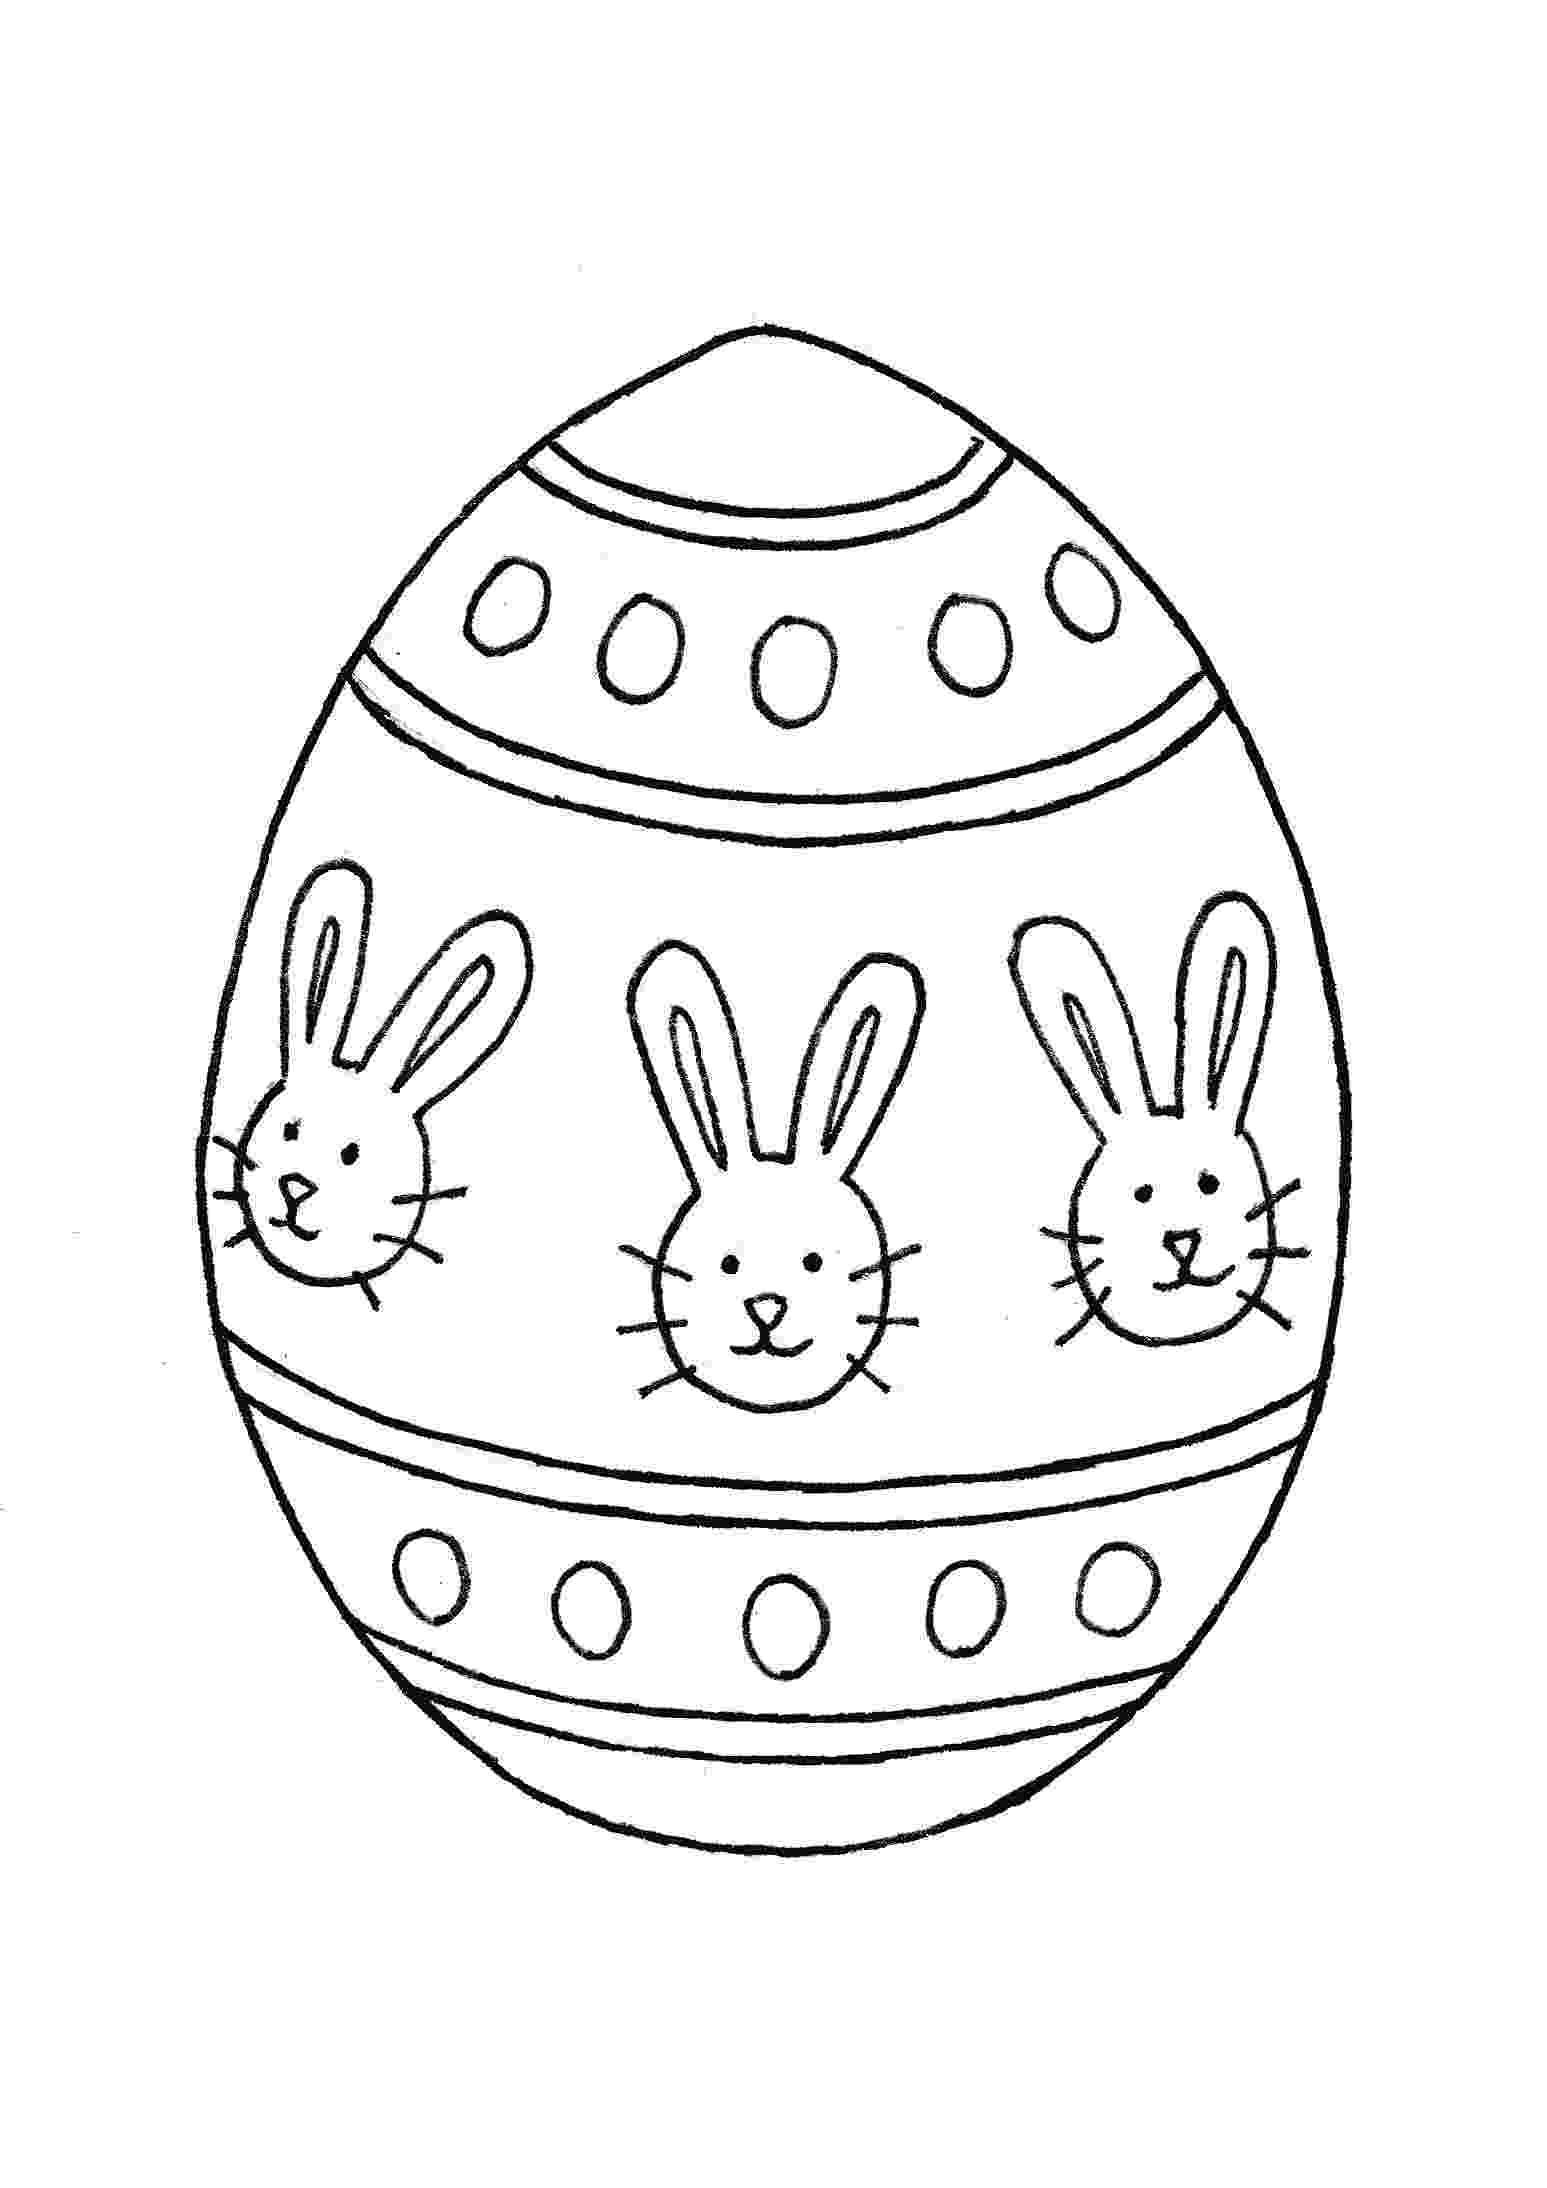 easter egg patterns easter art projects for kids ken bromley art supplies egg easter patterns